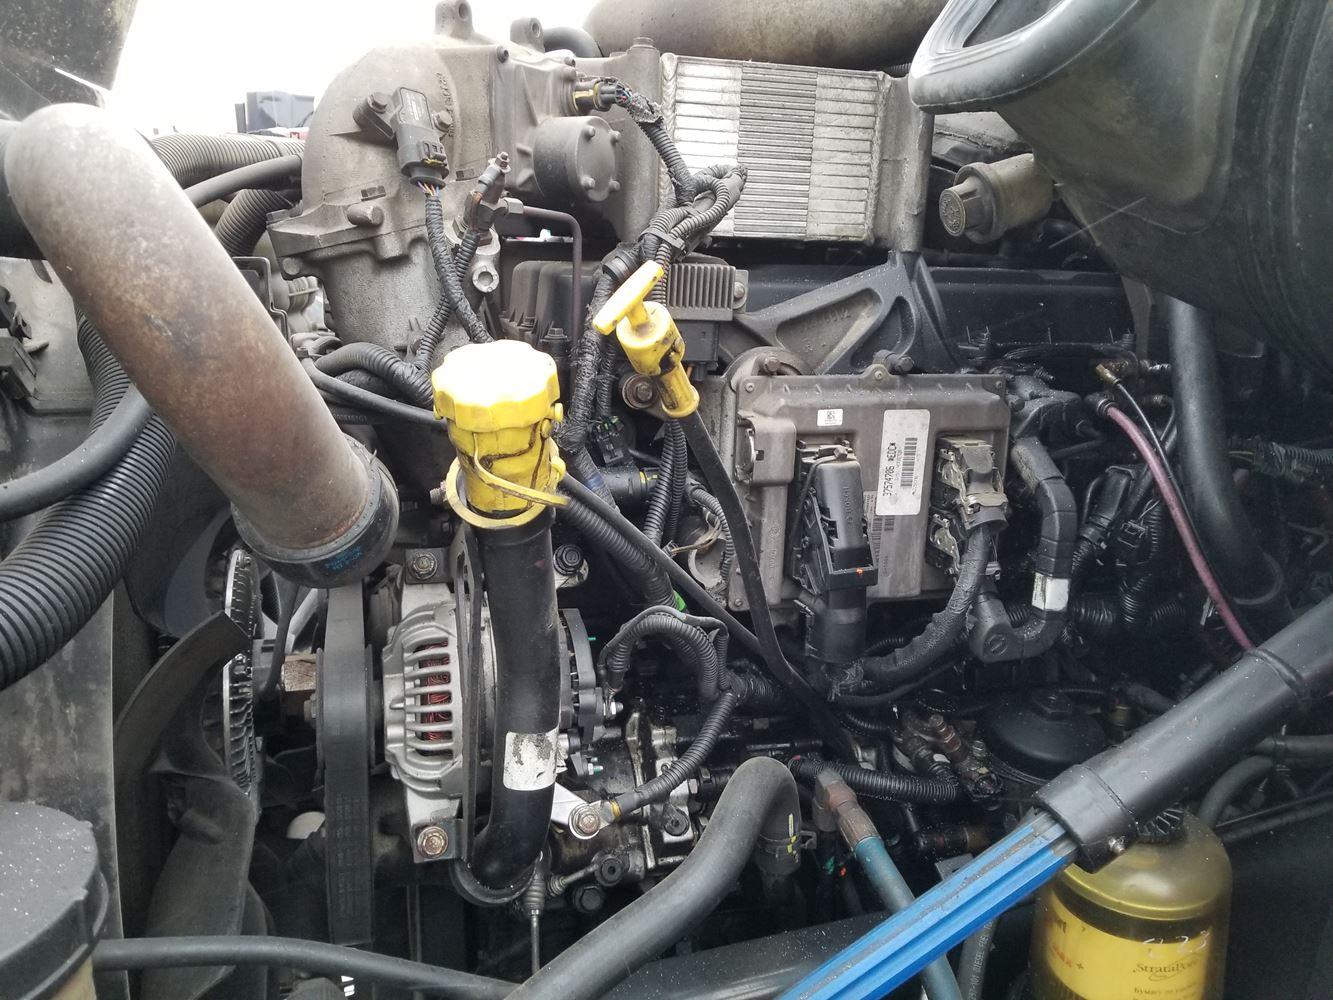 windshield wiper wiring diagram coronary anatomy 2010 international maxxforce 13 (stock #10818-15) | engine assys tpi